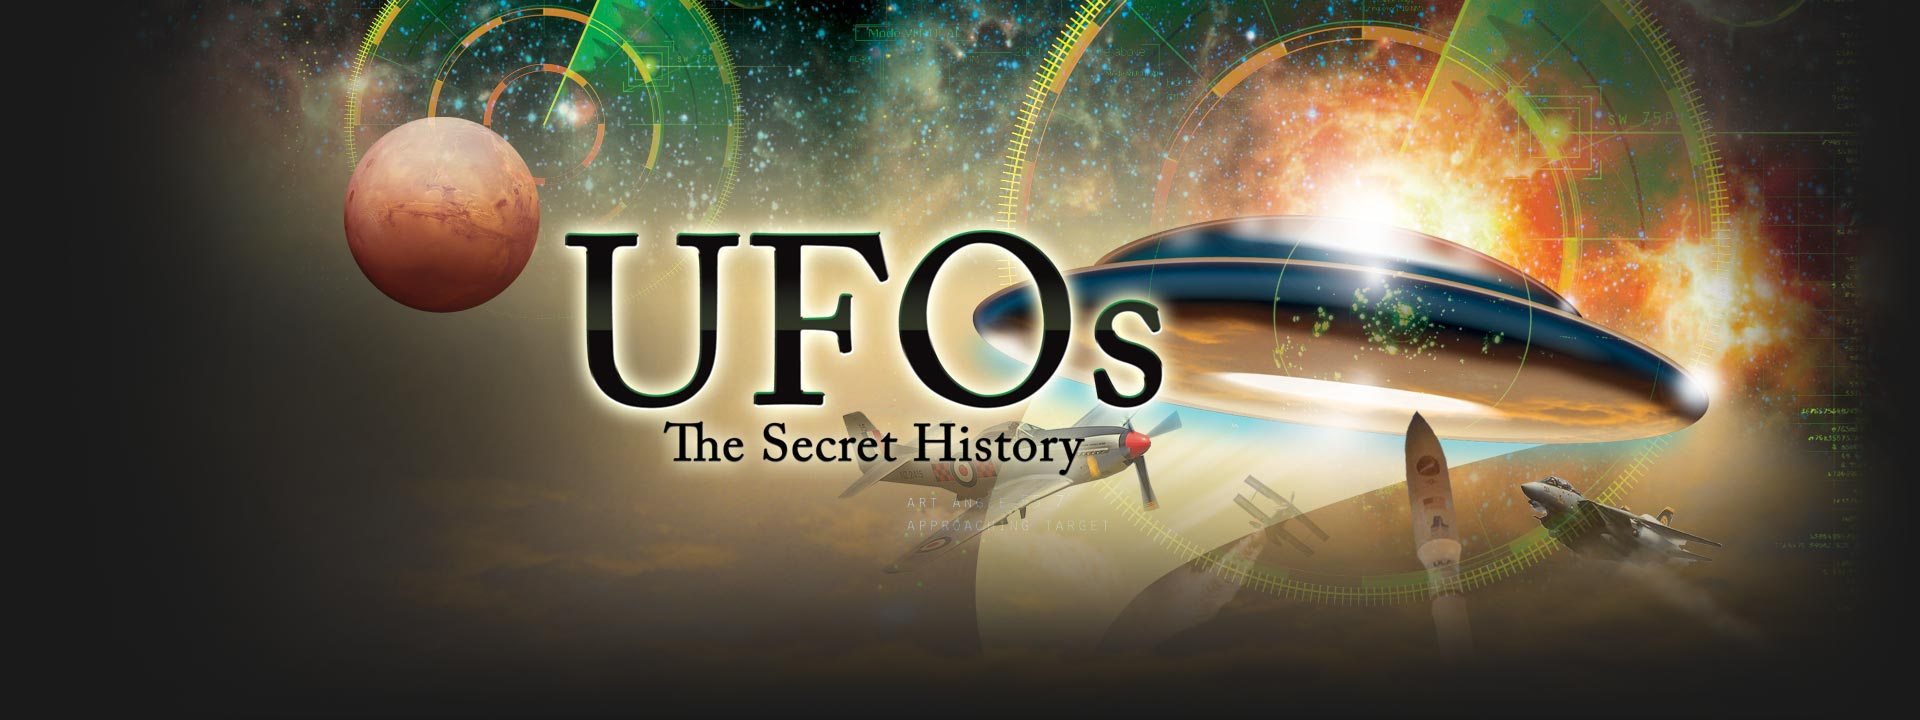 UFOs - The Secret History